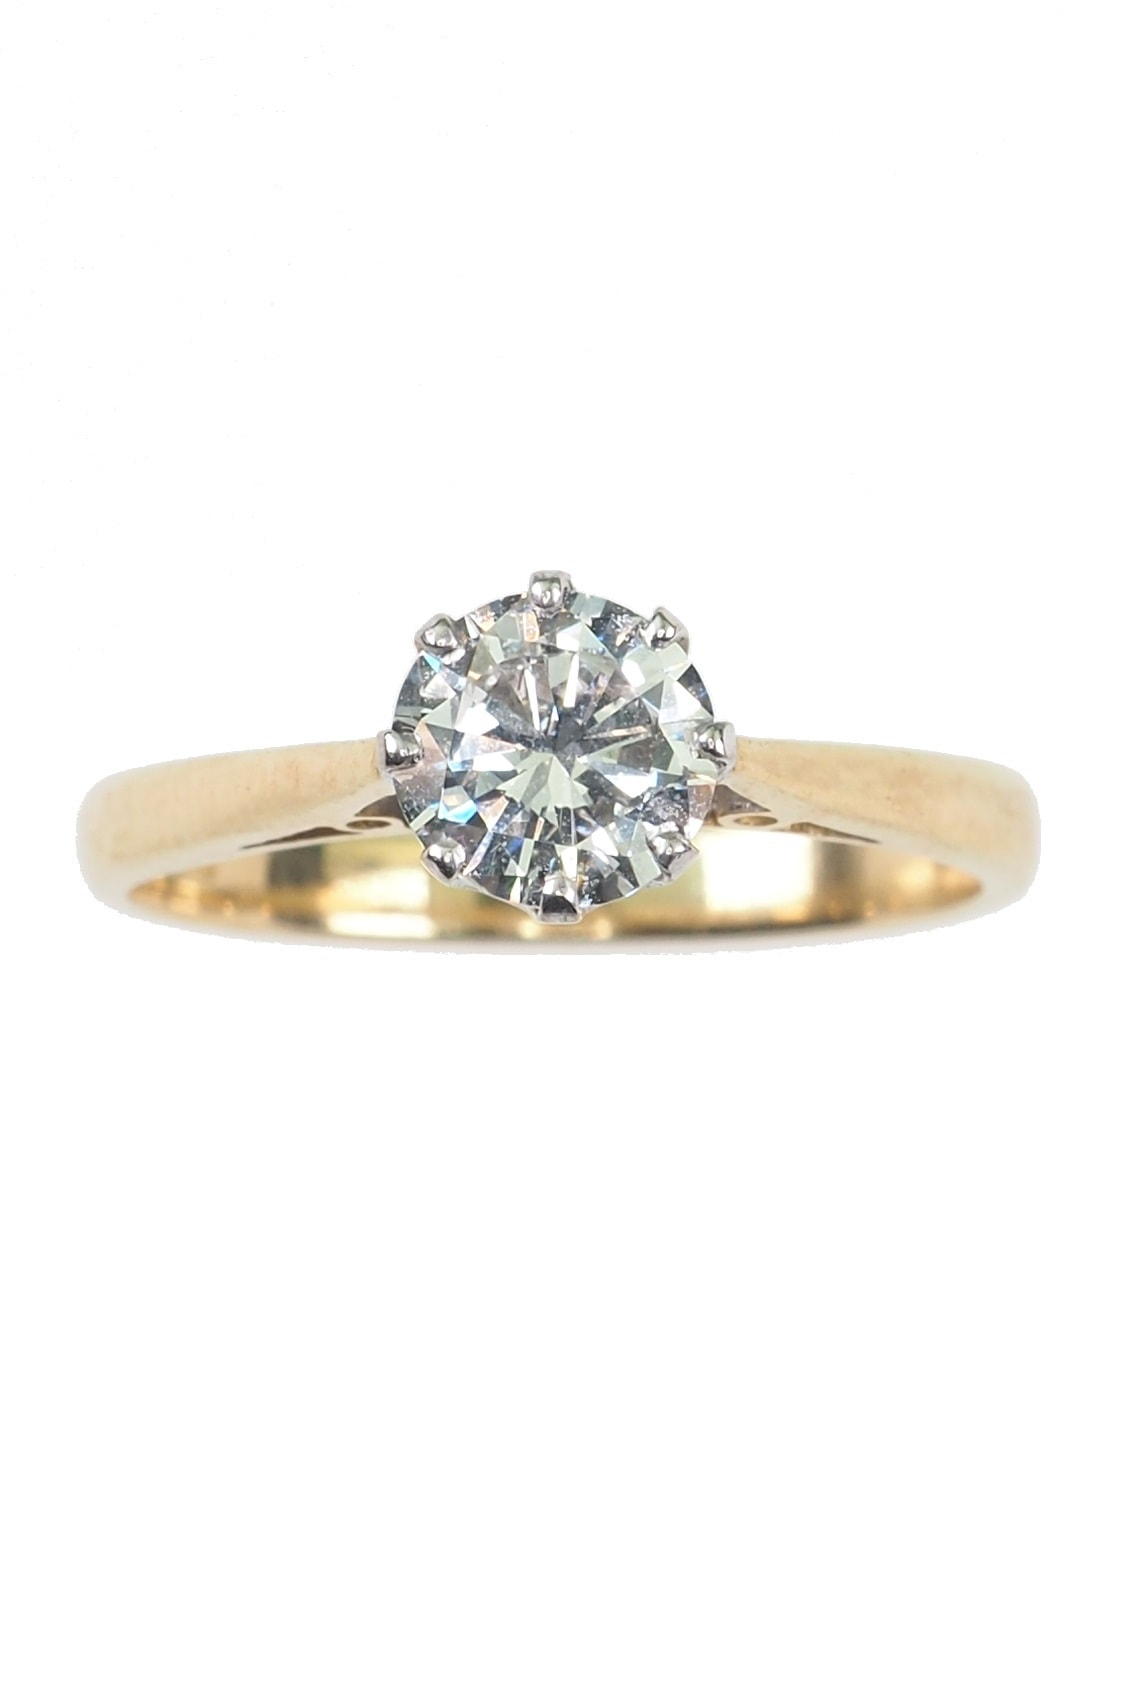 zertifizierten-Diamantschmuck-kaufen-0226